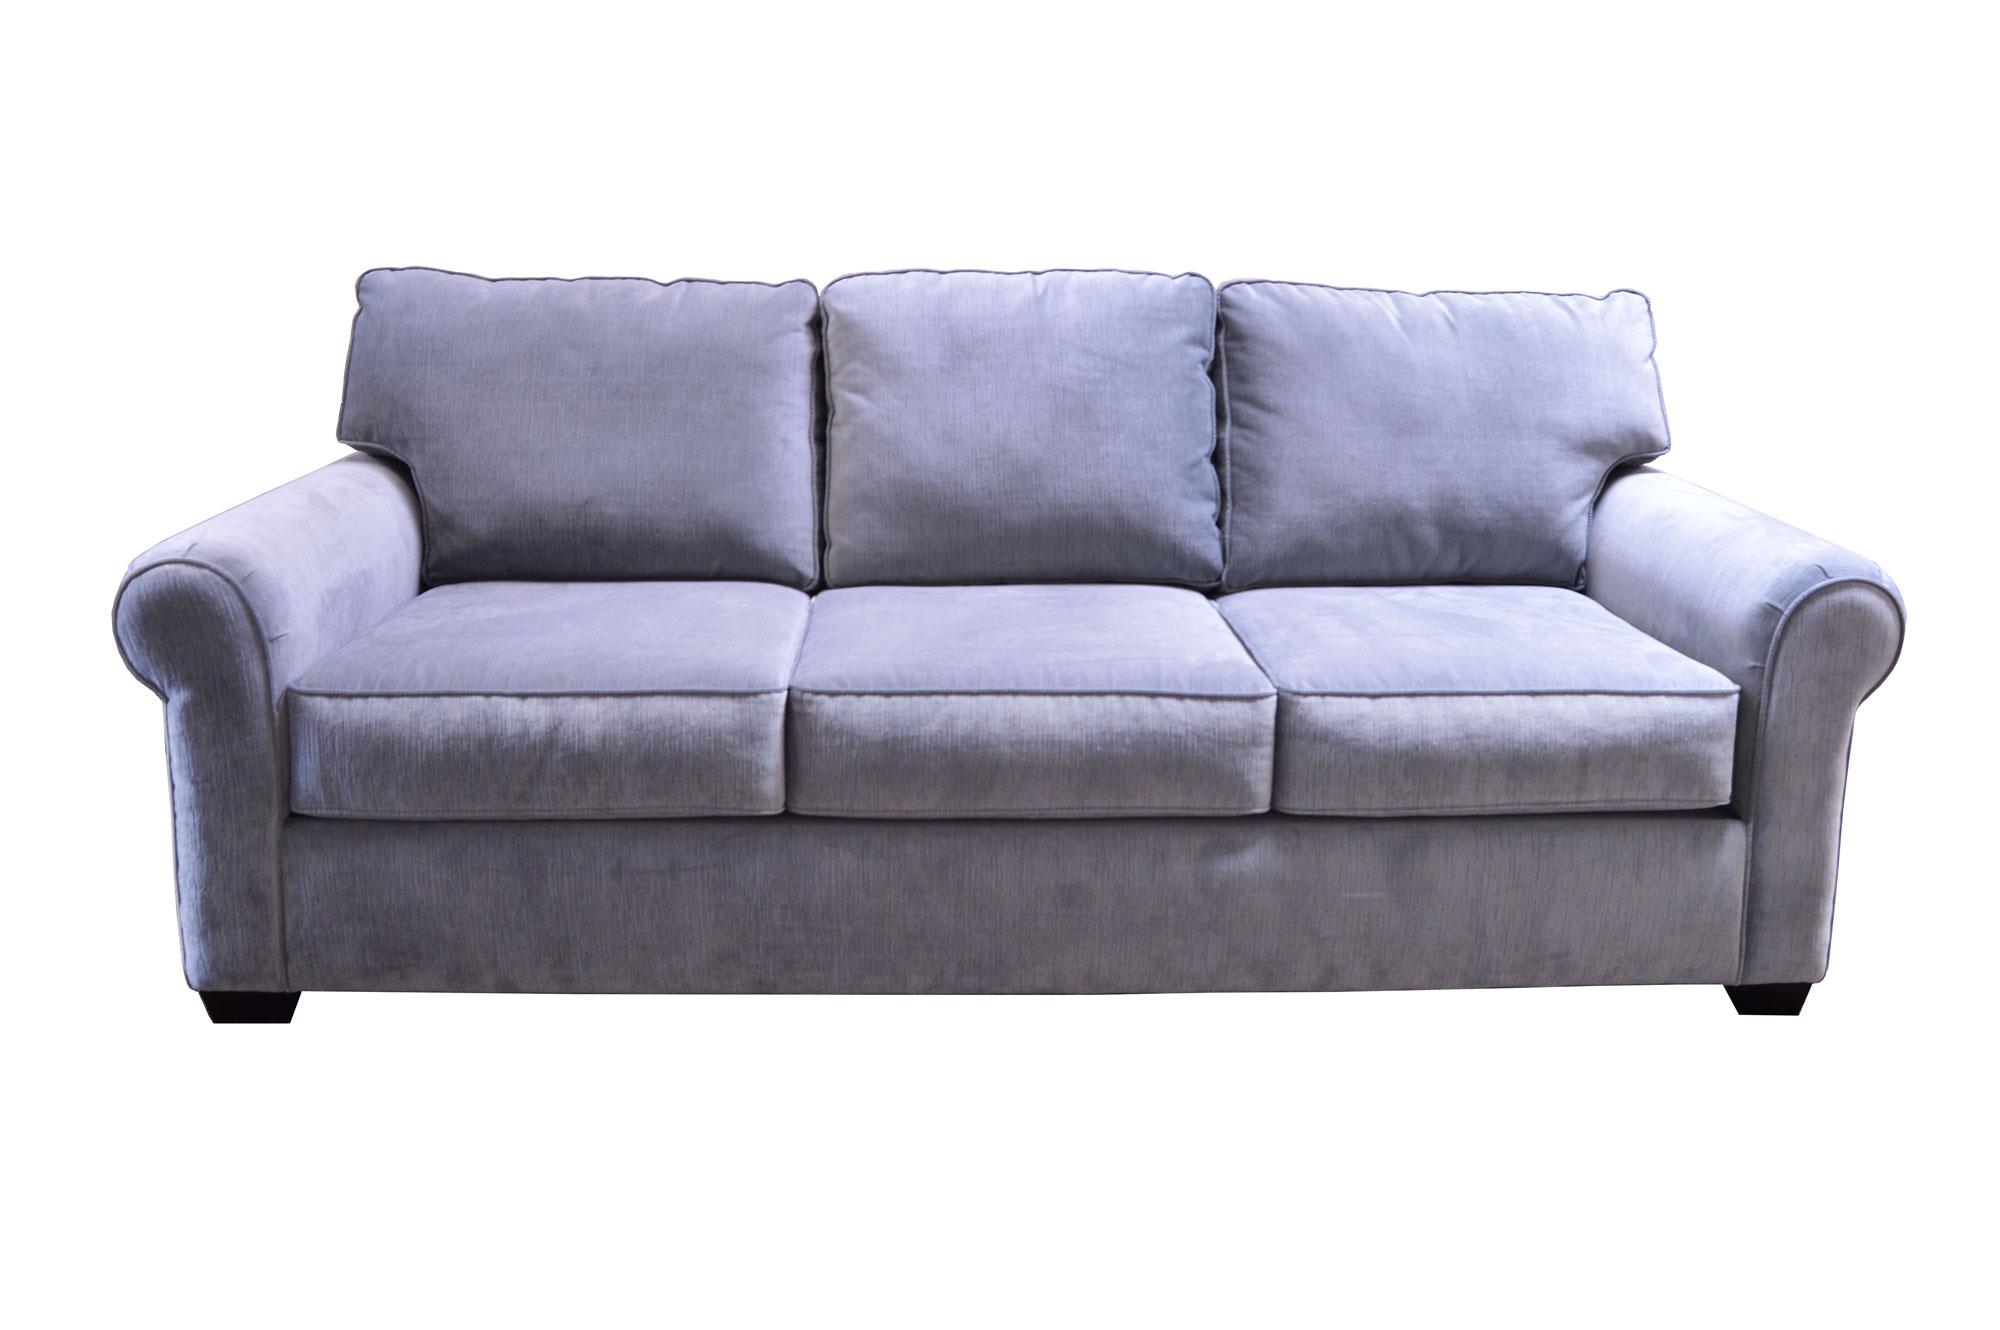 Sofa Sets Sectional Sofas Custom Sofas 4 Less Santa